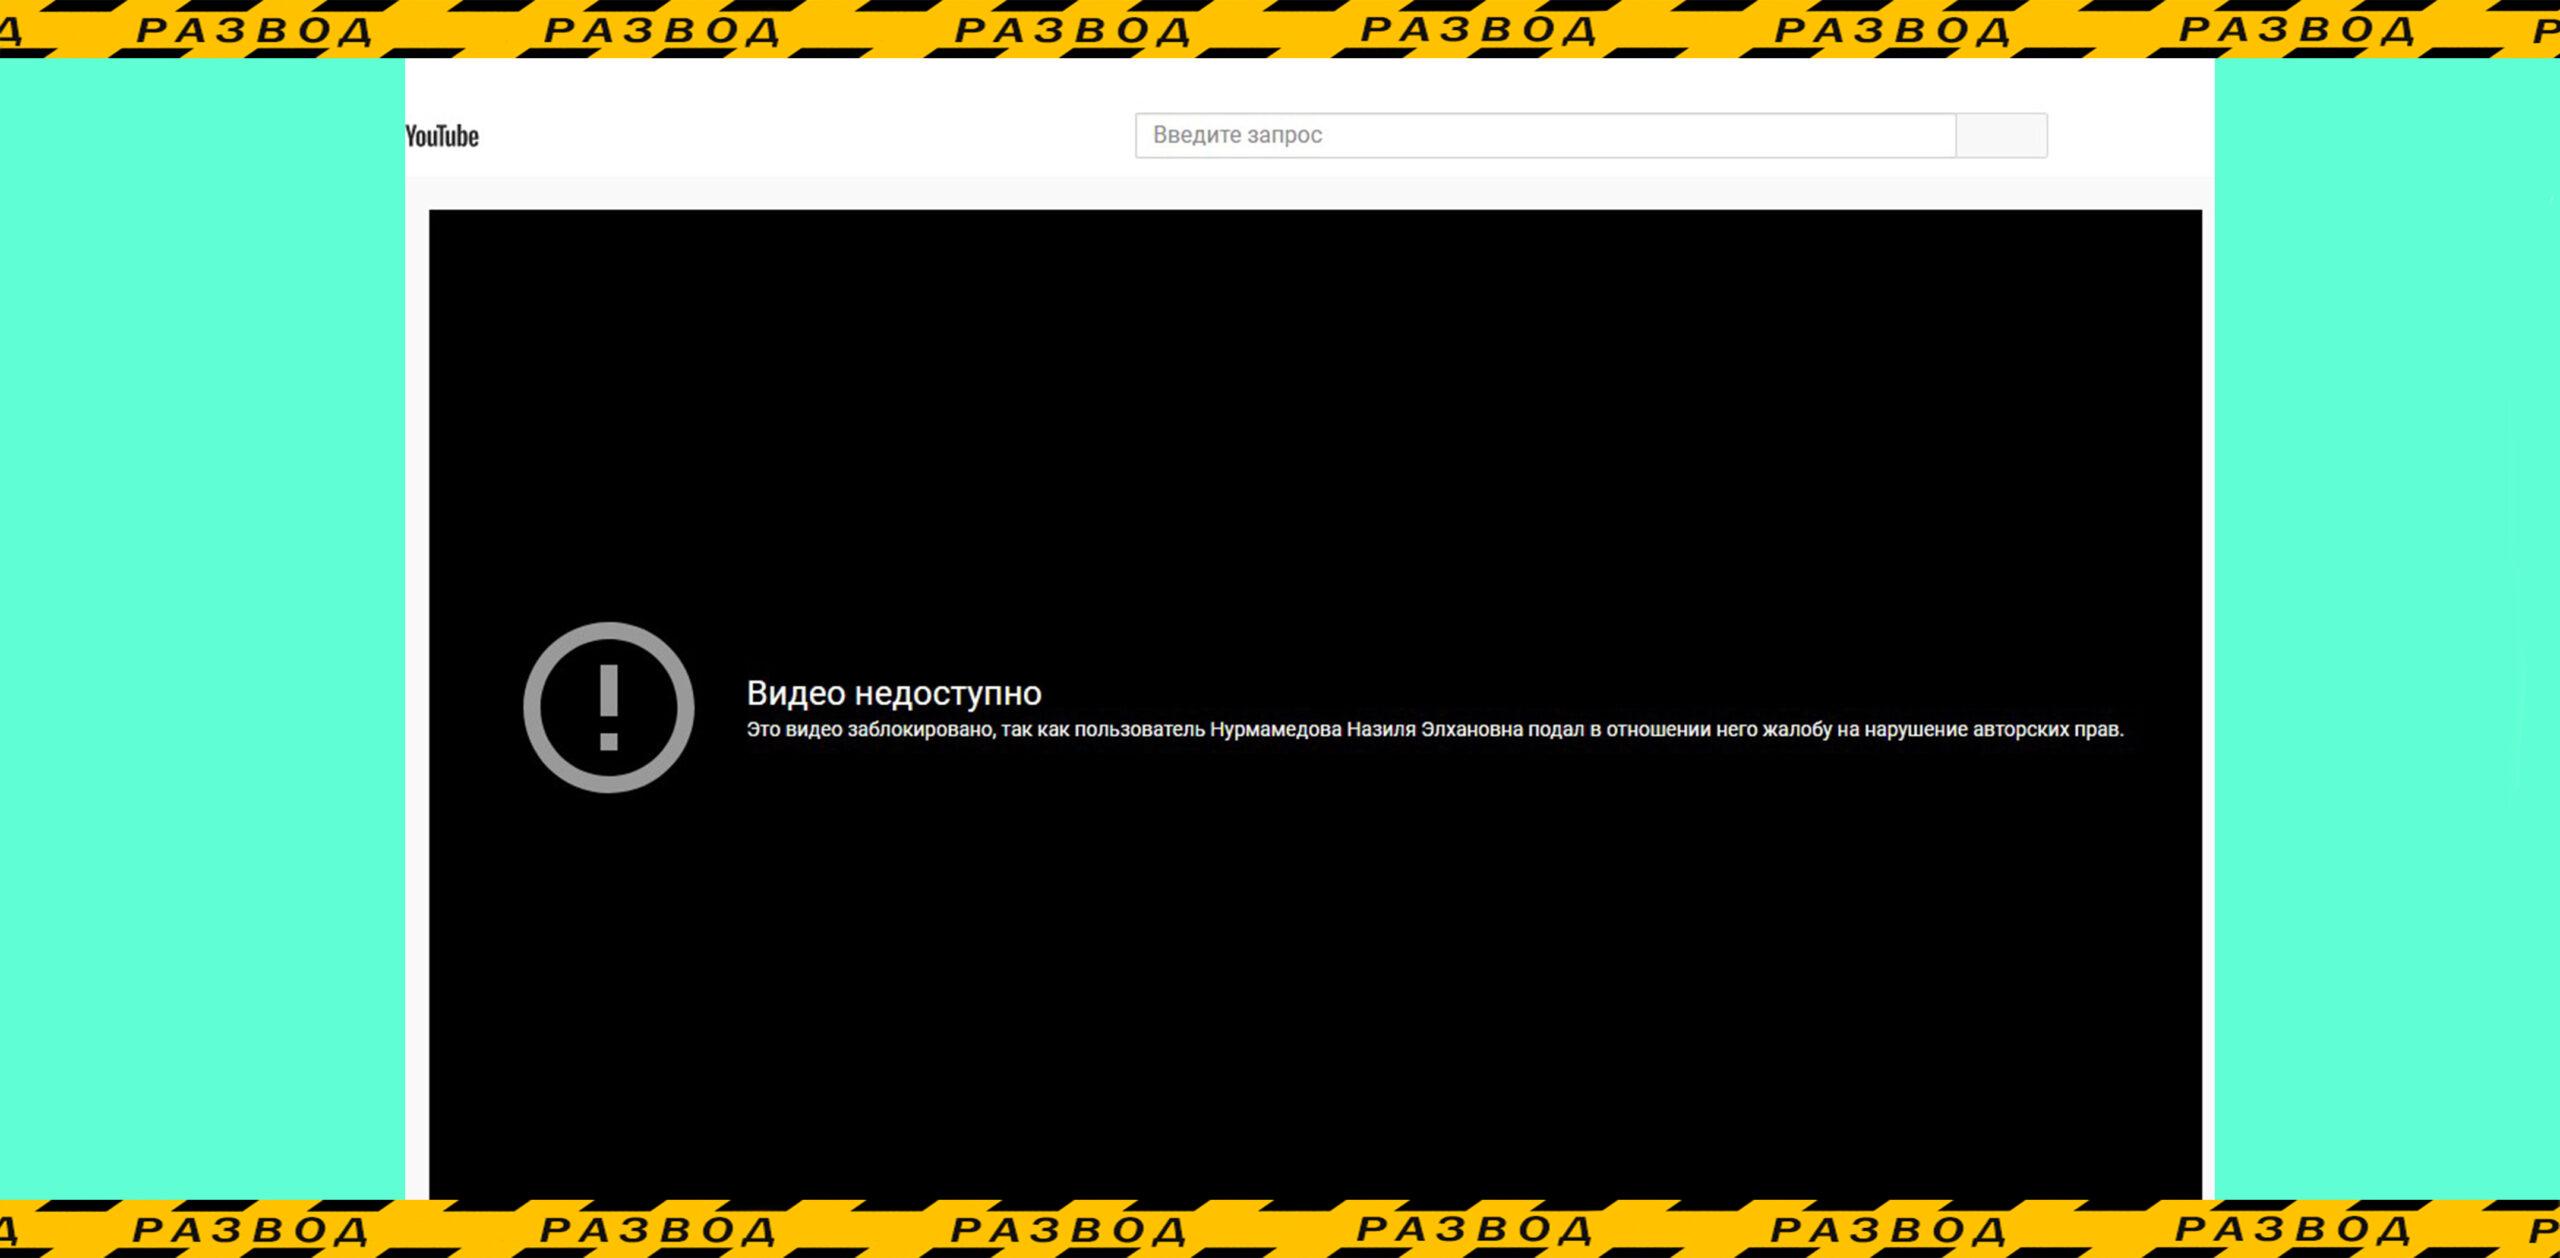 Недоступное видео на сайте ютуб